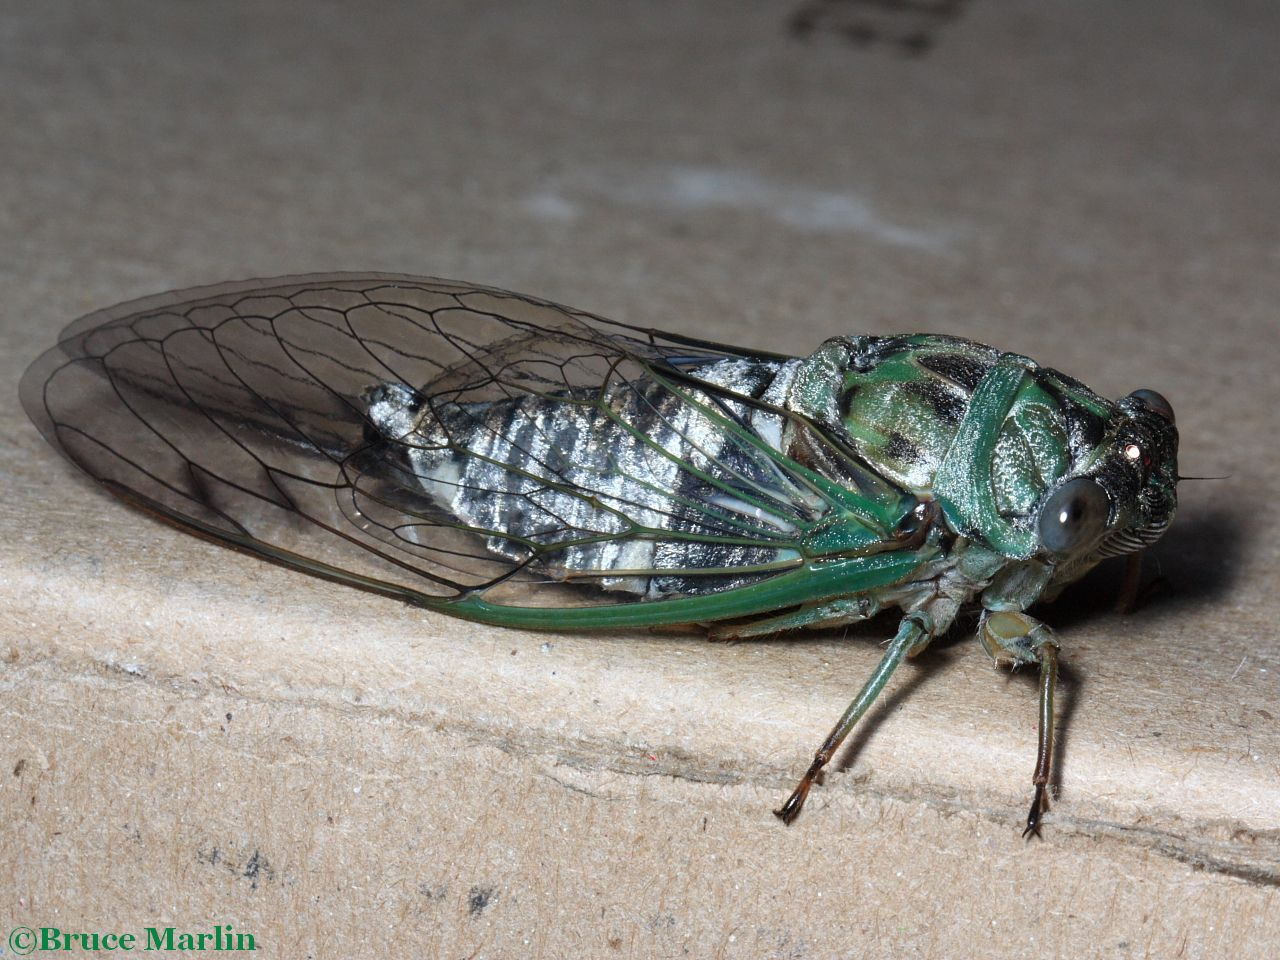 Newly-emerged periodic cicada